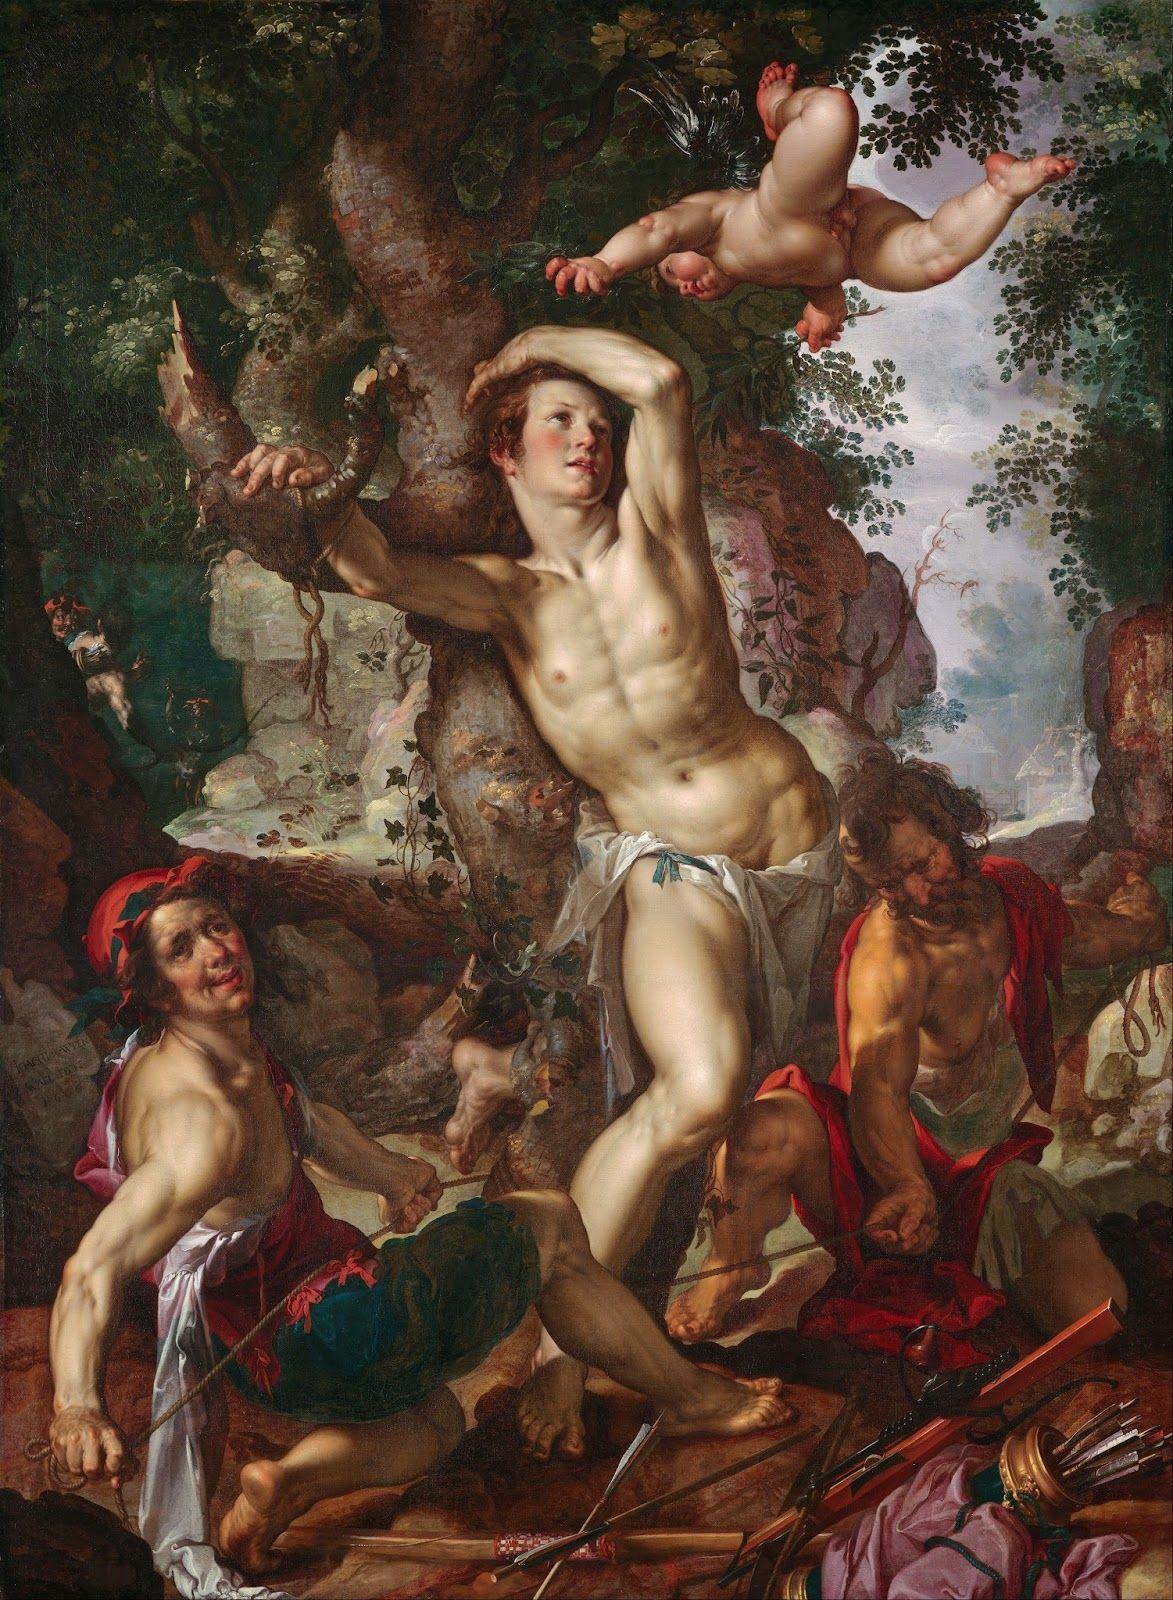 Joachim Anthonisz. Wtewael: The Martyrdom of Saint Sebastian (1600)